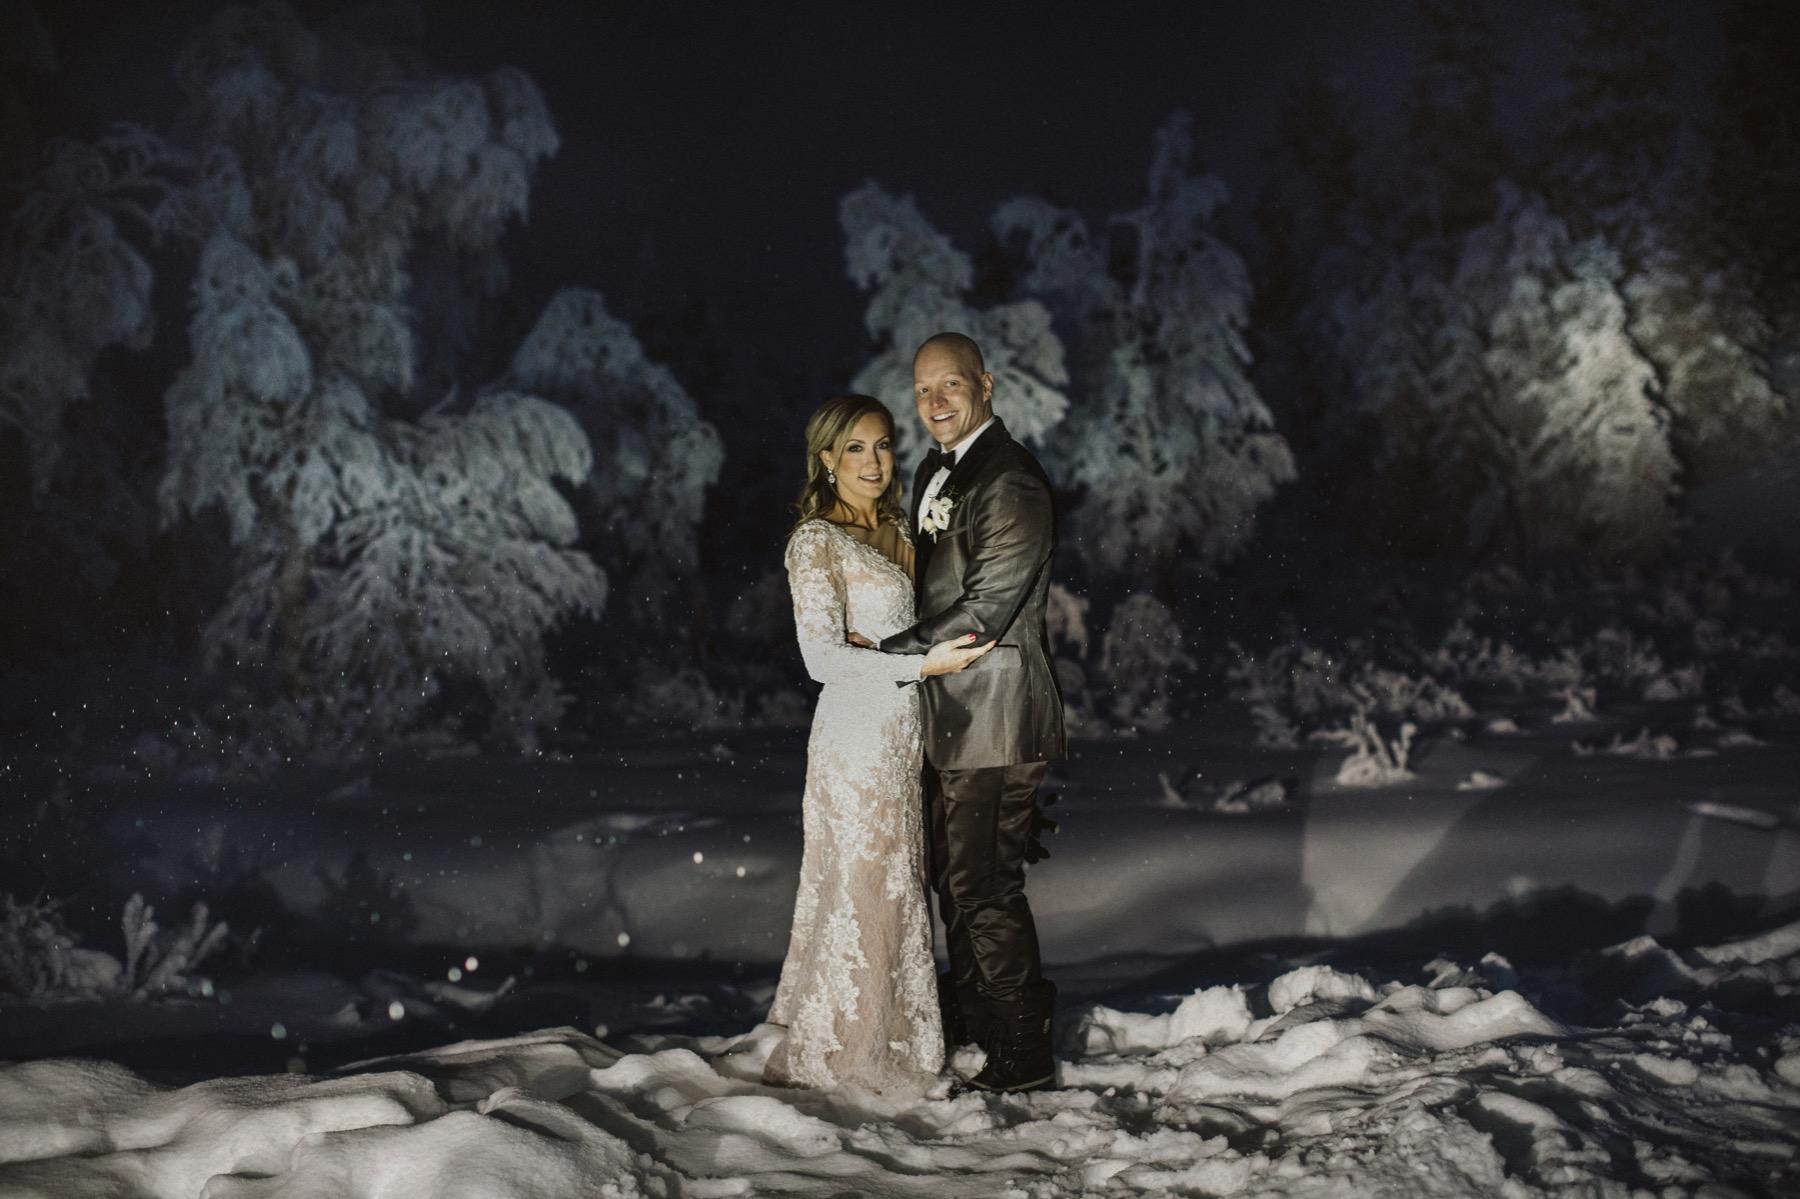 Night session Lapland